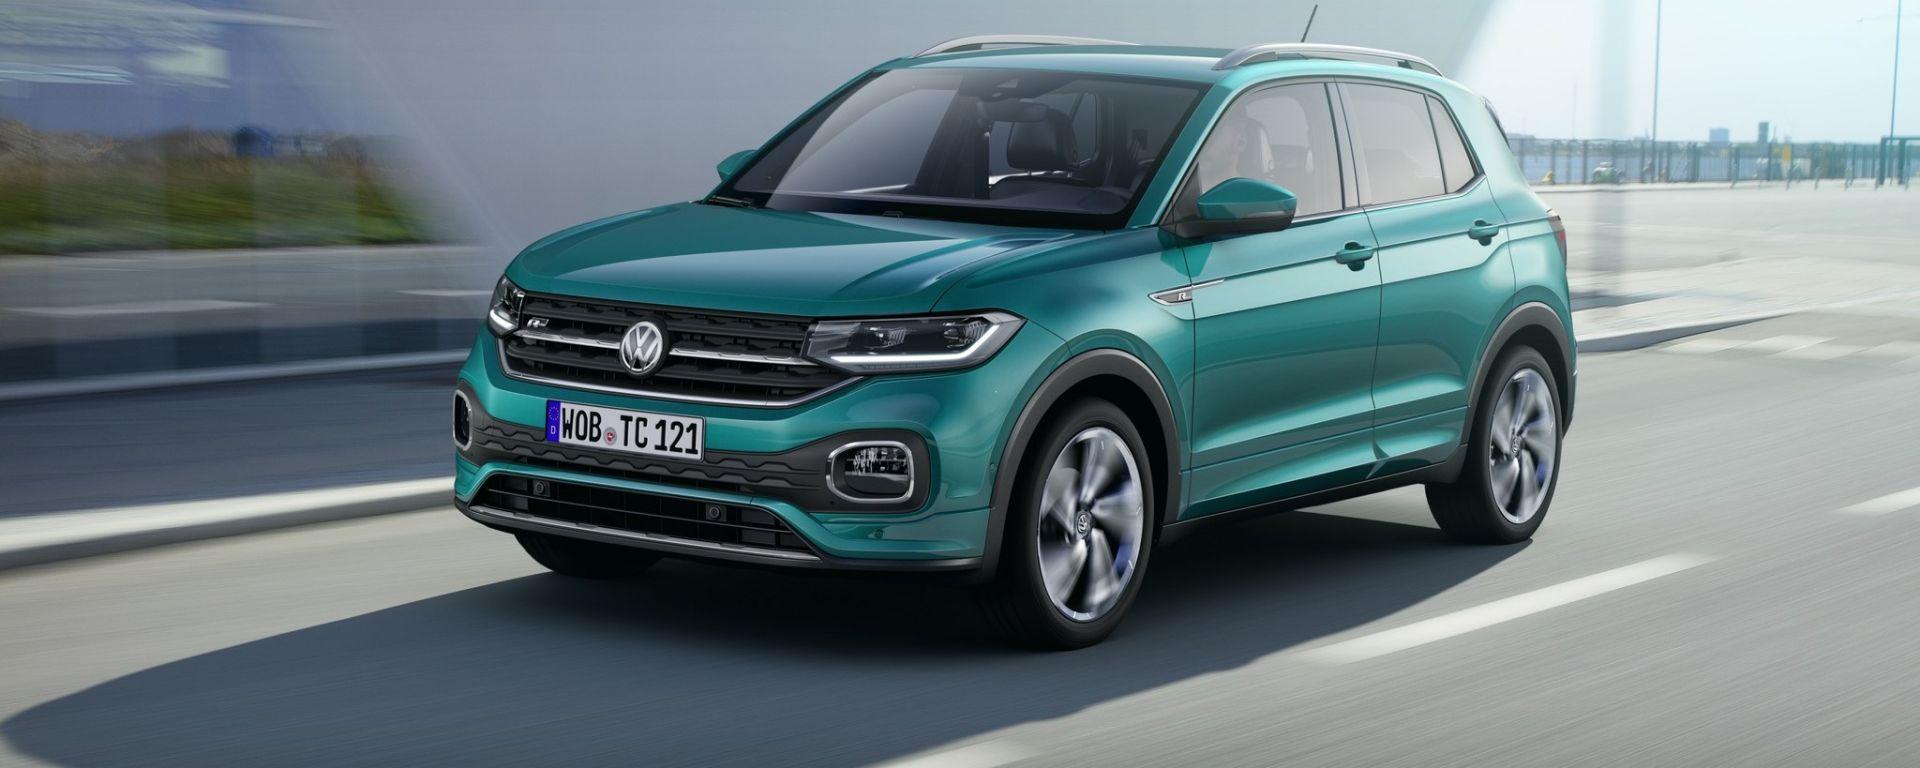 Volkswagen T Cross 2018 Prova Dotazioni Prezzi Foto